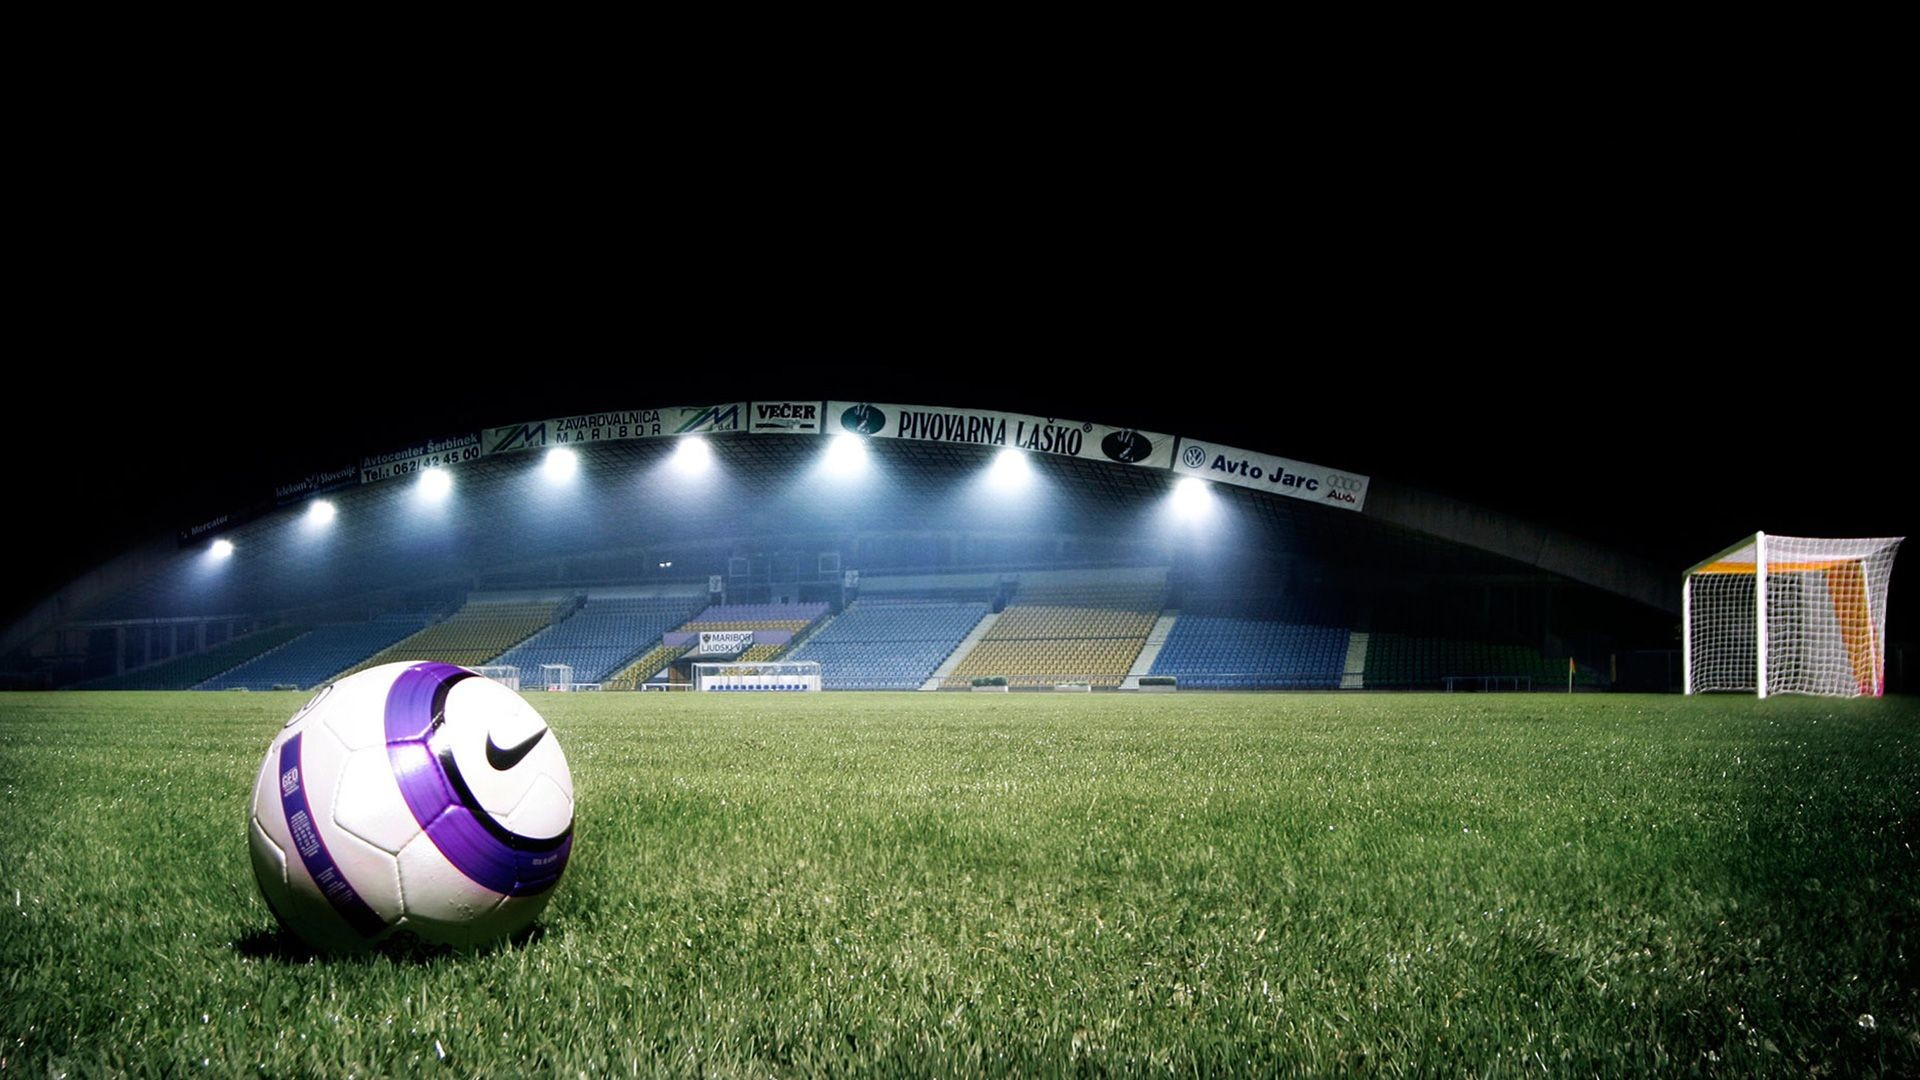 … football wallpaper the best football hd wallpapers players …